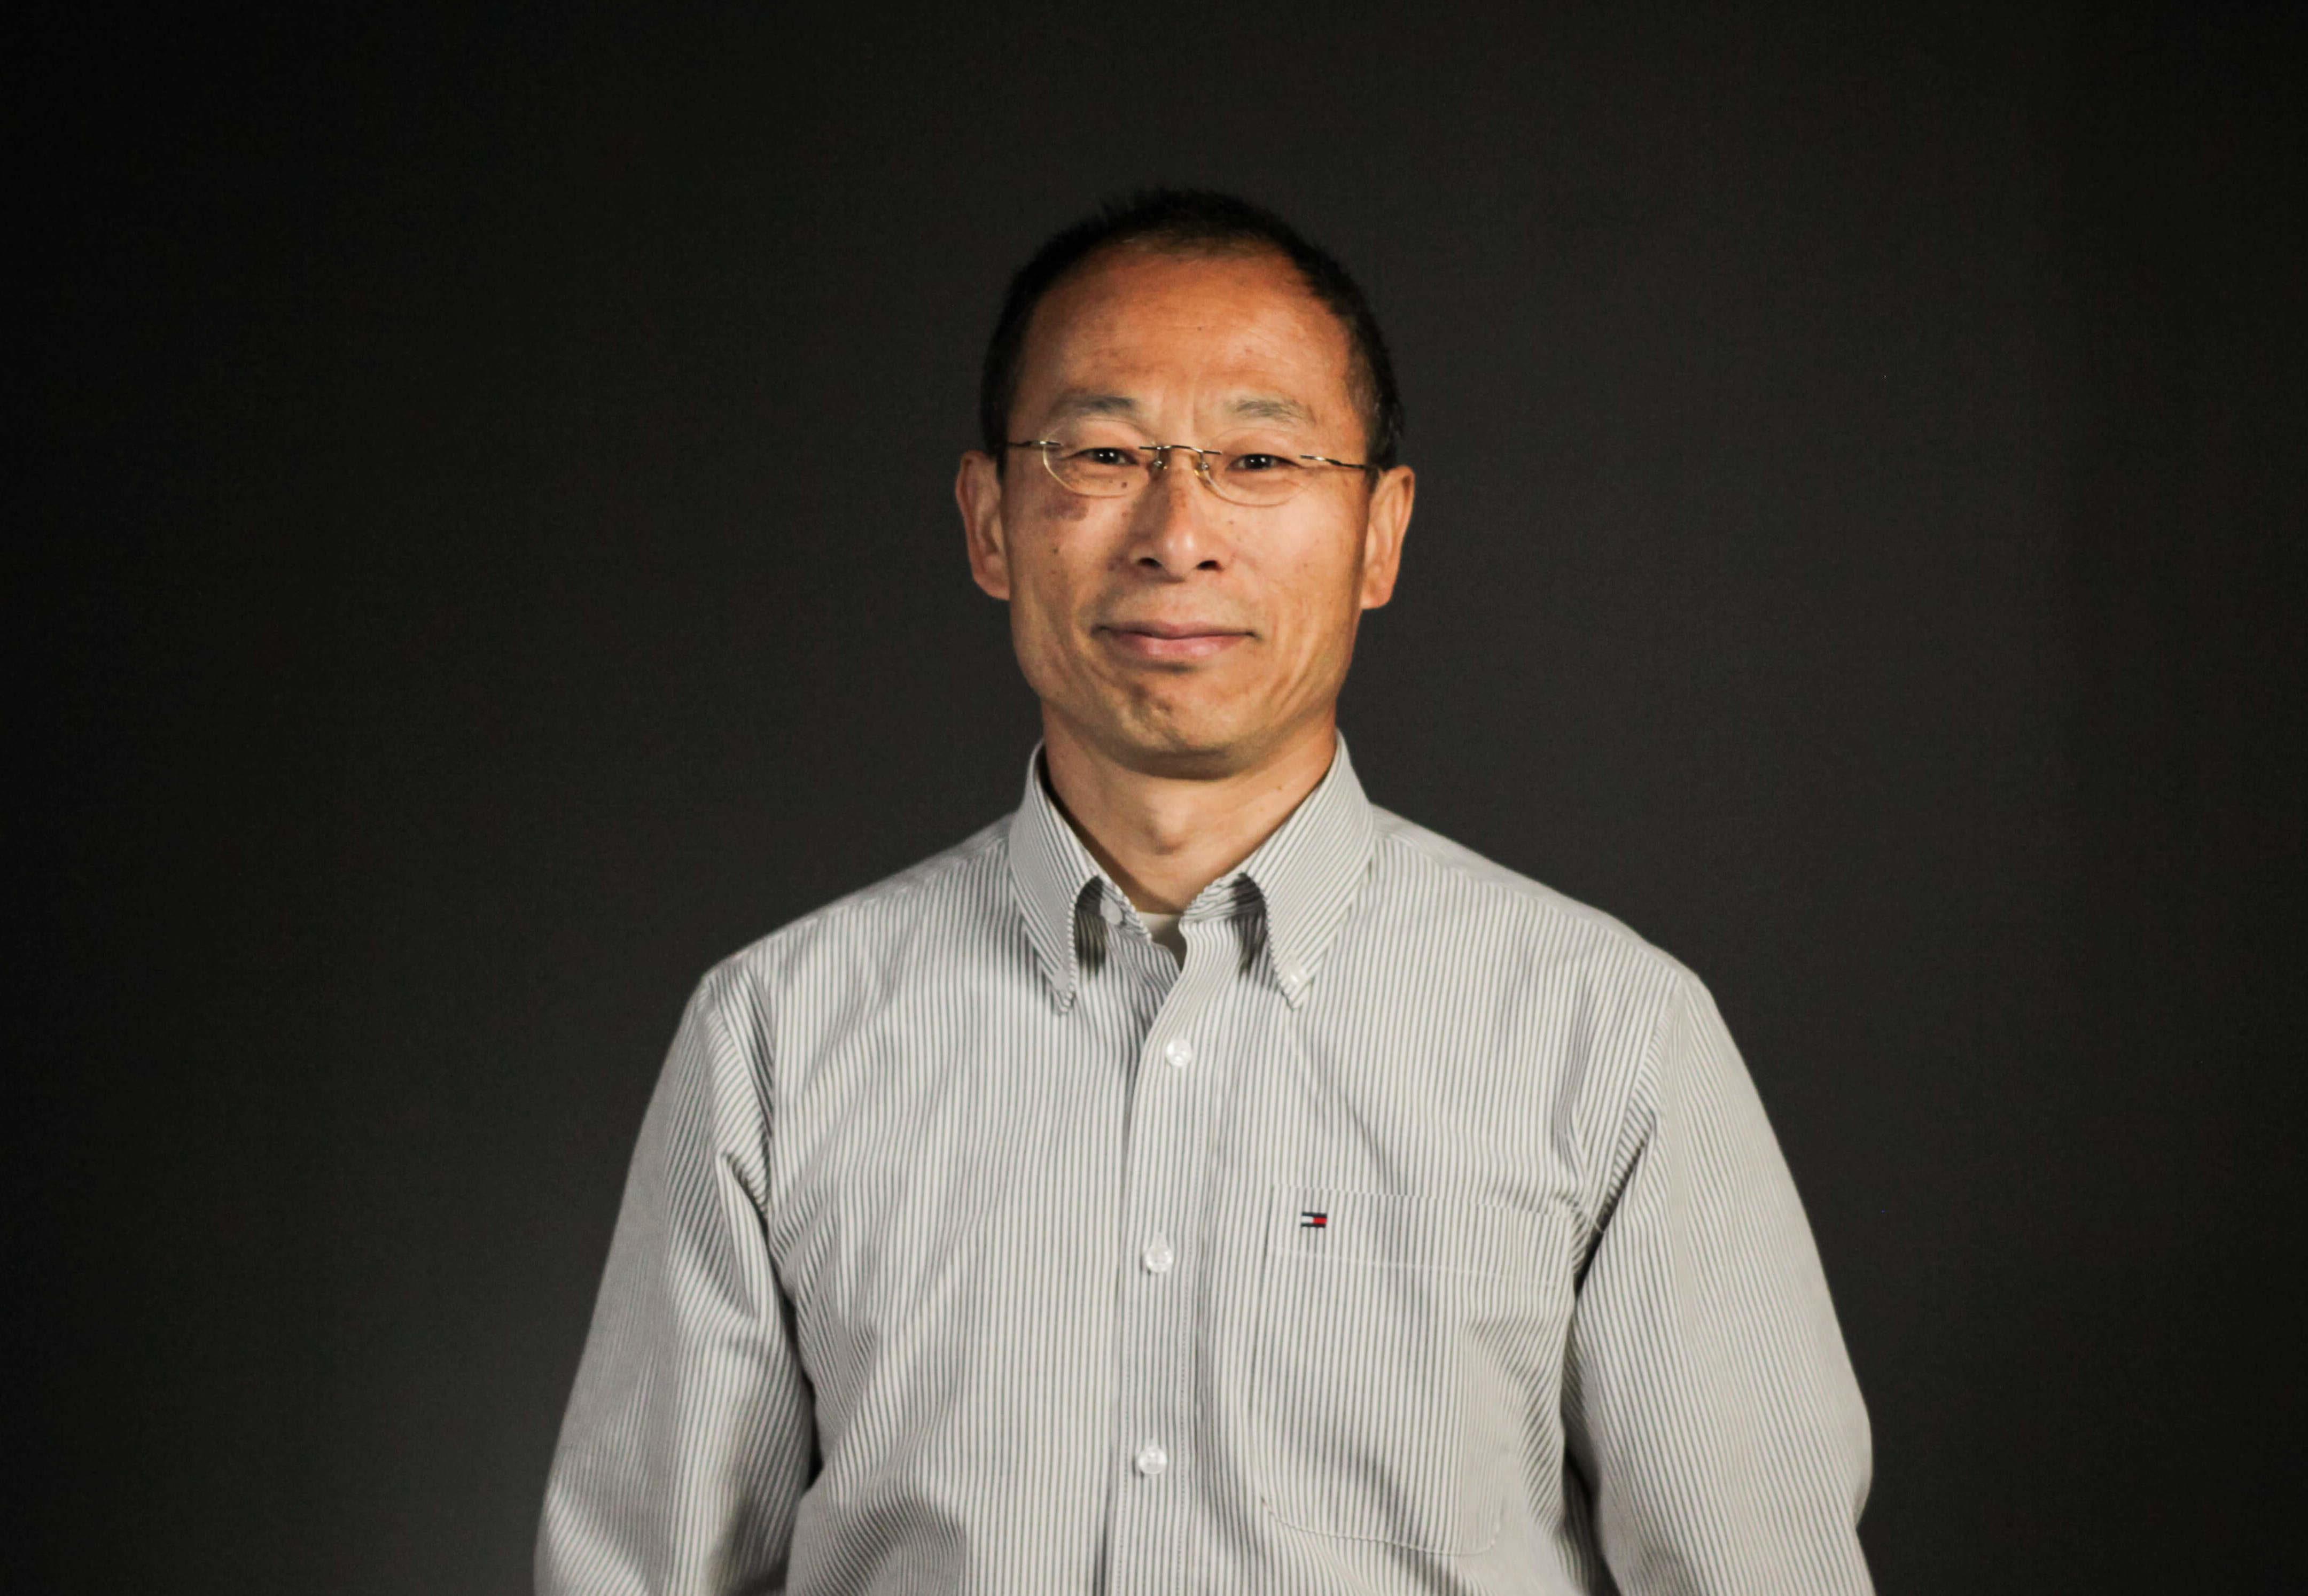 Yujie Jay Tang